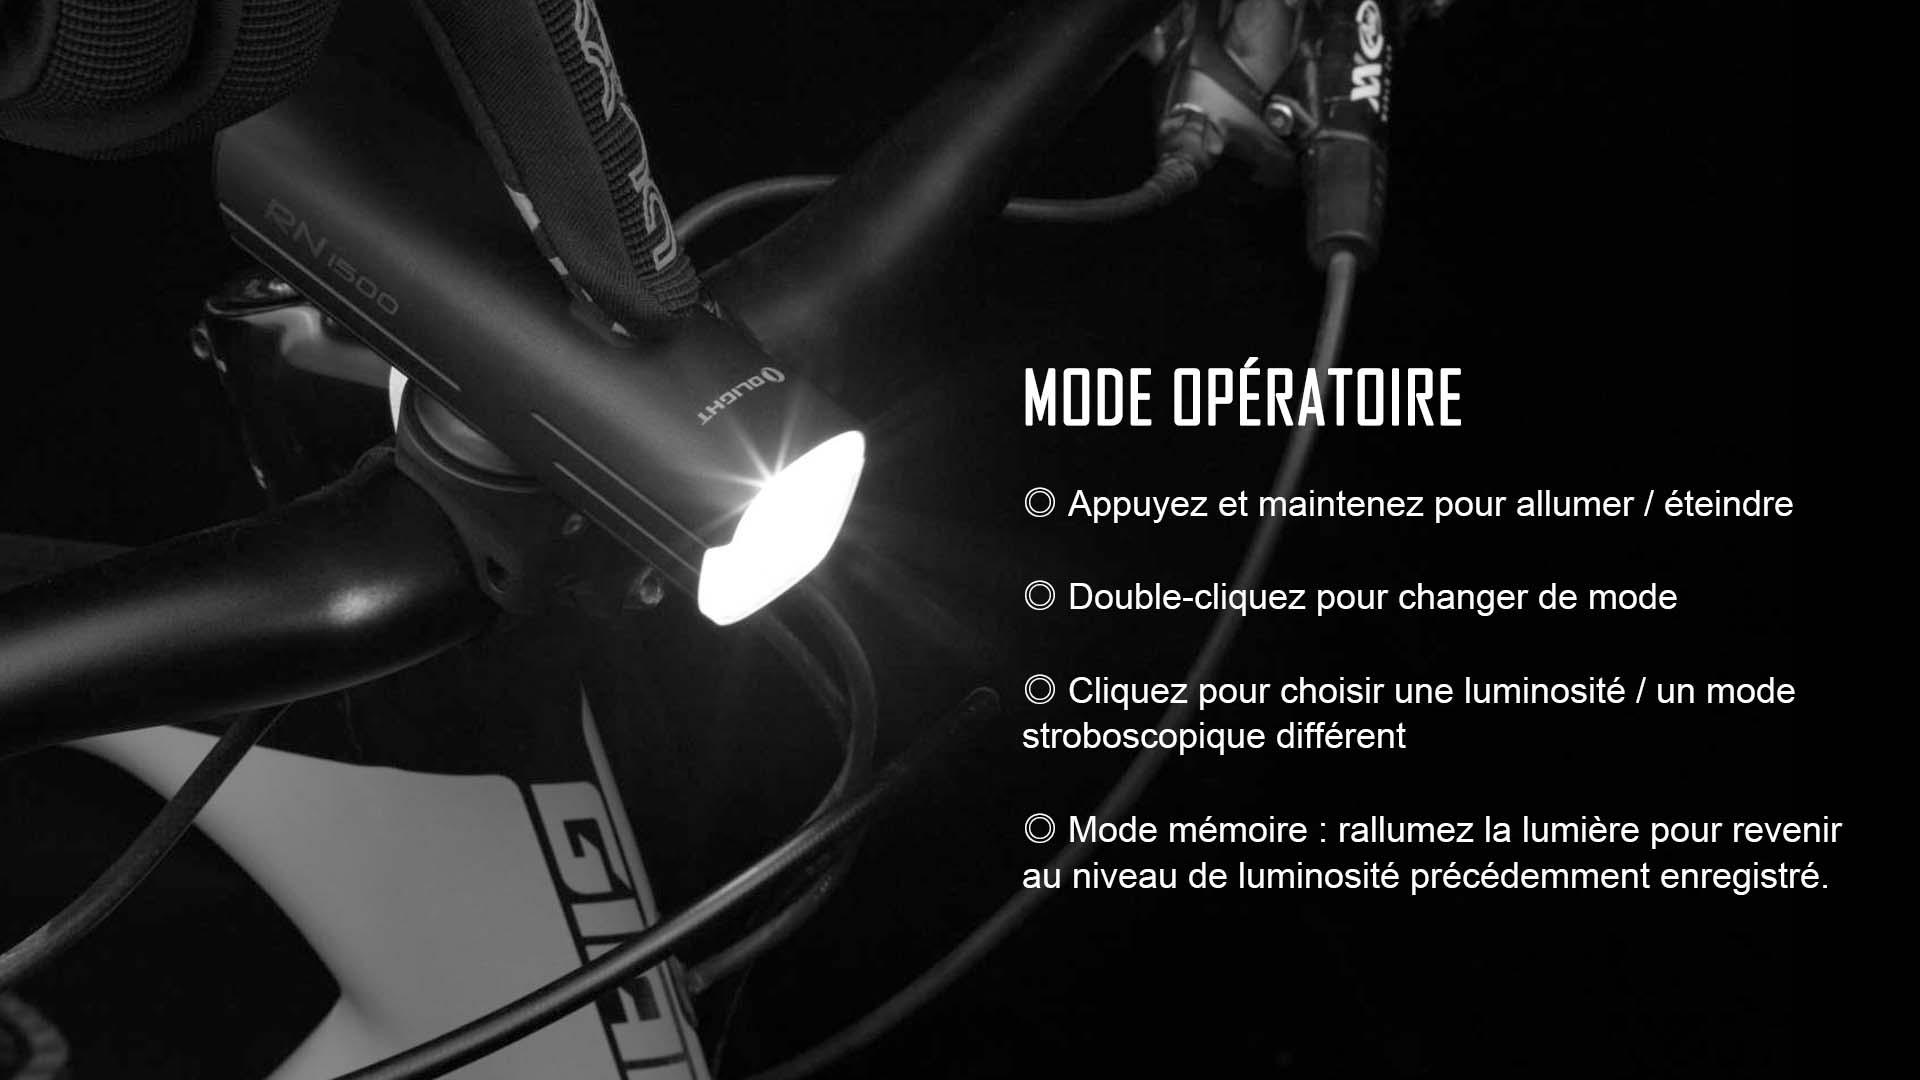 RN 1500 mode opératoire